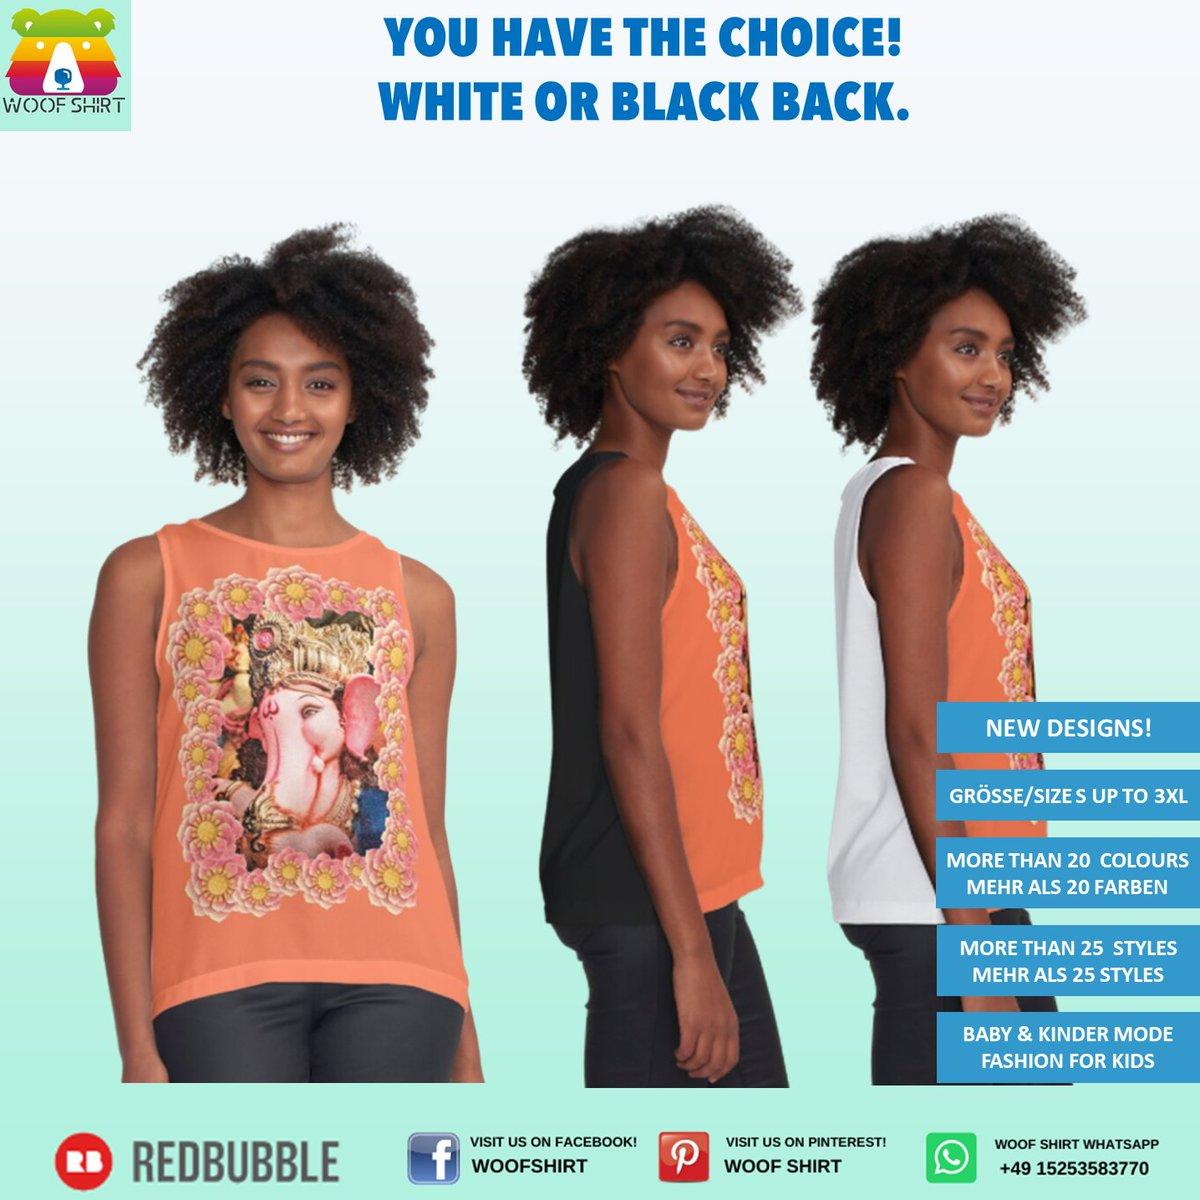 Design https://buff.ly/2HAB7XV - #fashion #love #style #beautiful #beauty #ootd #girl #fashionblogger #mode #lifestyle #instafashion #fashionista #shopping #frauenmode #mode #womanfashion #fashionwoman #modeblogger #frauenpower #womensfashion #stilbewusst #frauenpic.twitter.com/s606HquOQP